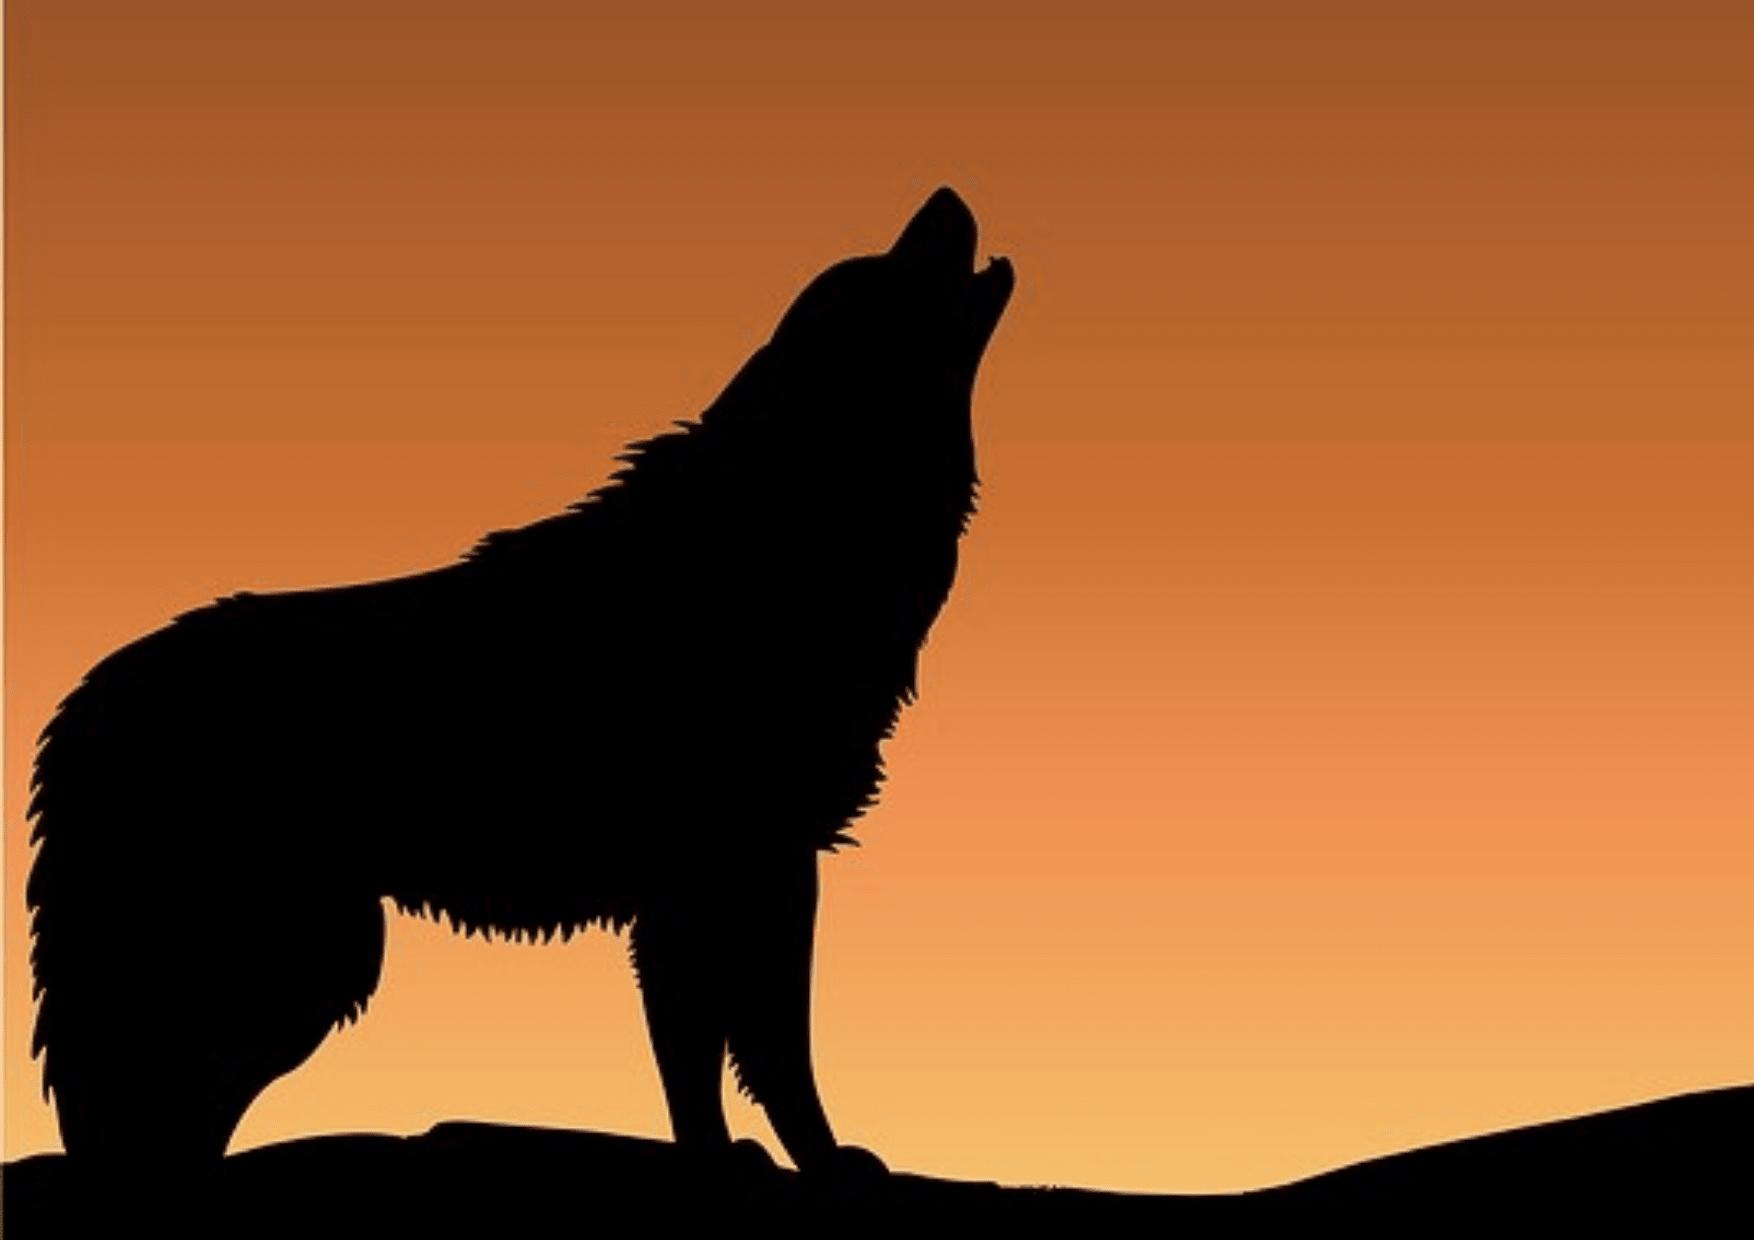 Mammal,                Silhouette,                Dog,                Like,                Illustration,                Black,                Yellow,                Red,                 Free Image